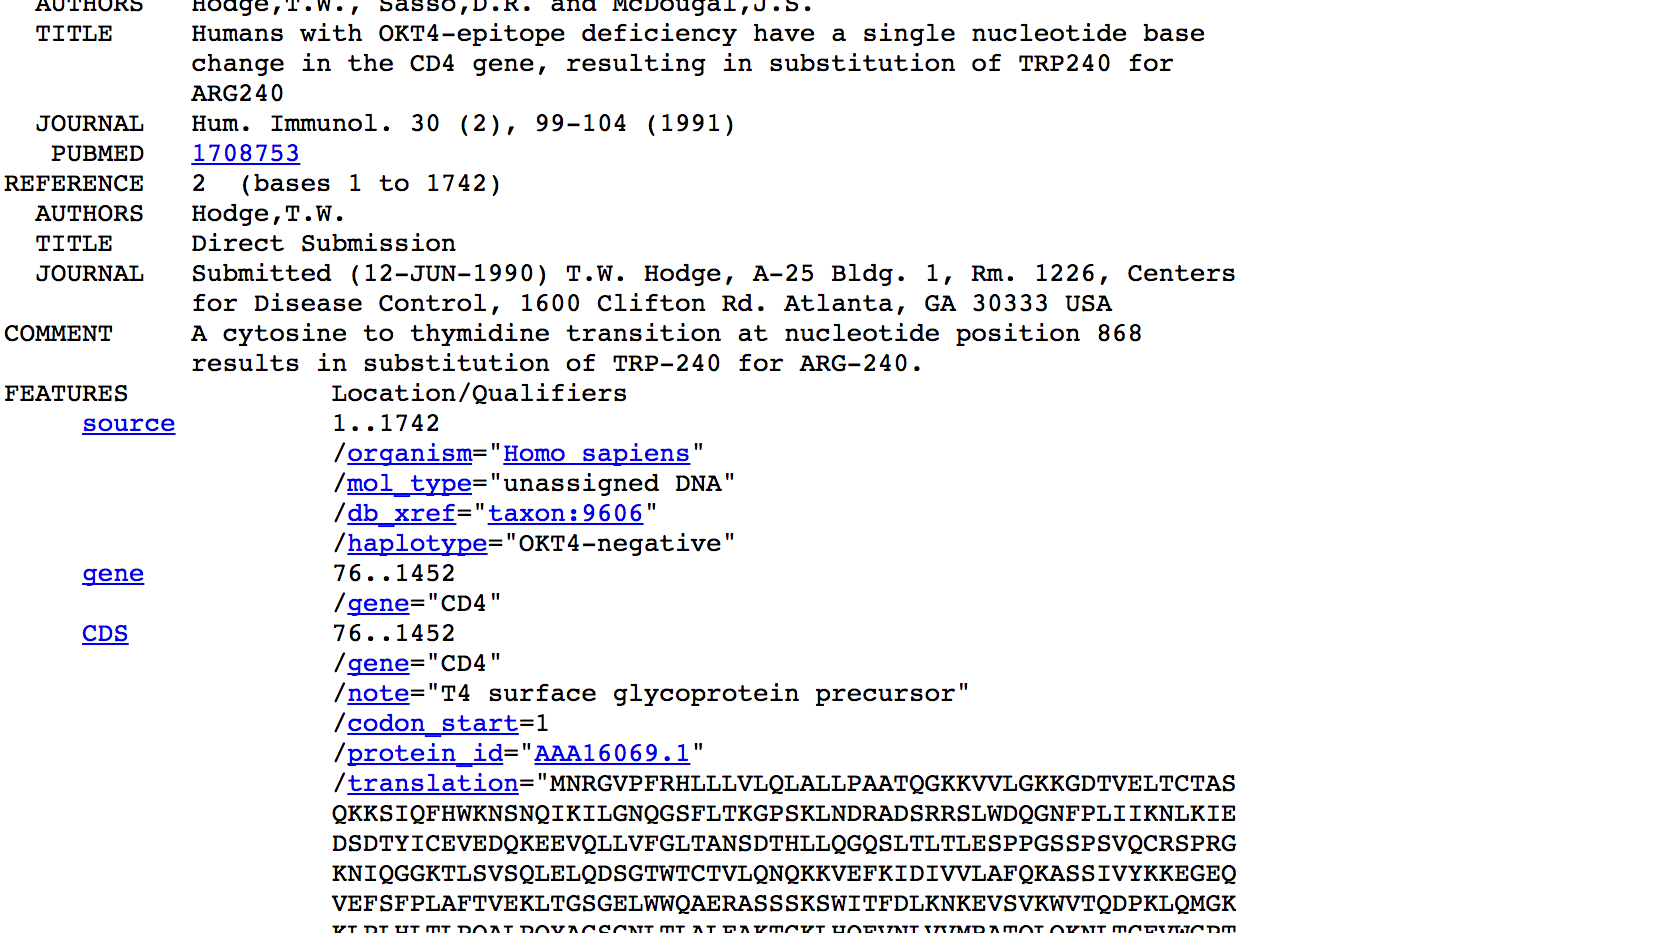 Database Analysis-Sequence Retrieval (6)